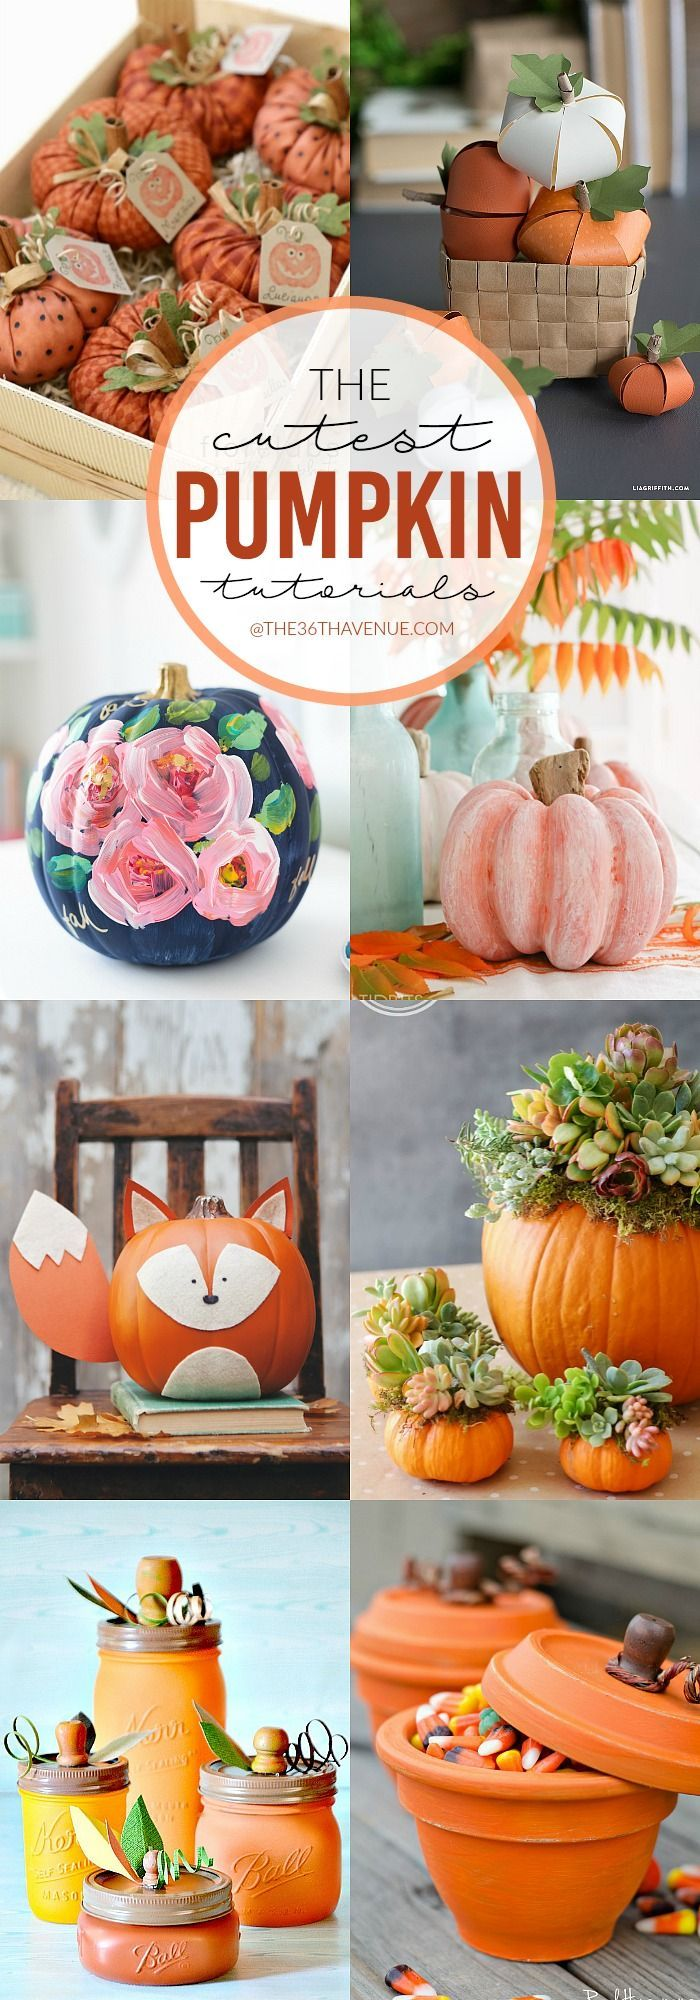 Fall crafts for adults to make - Fall Decor Diy Pumpkin Tutorials